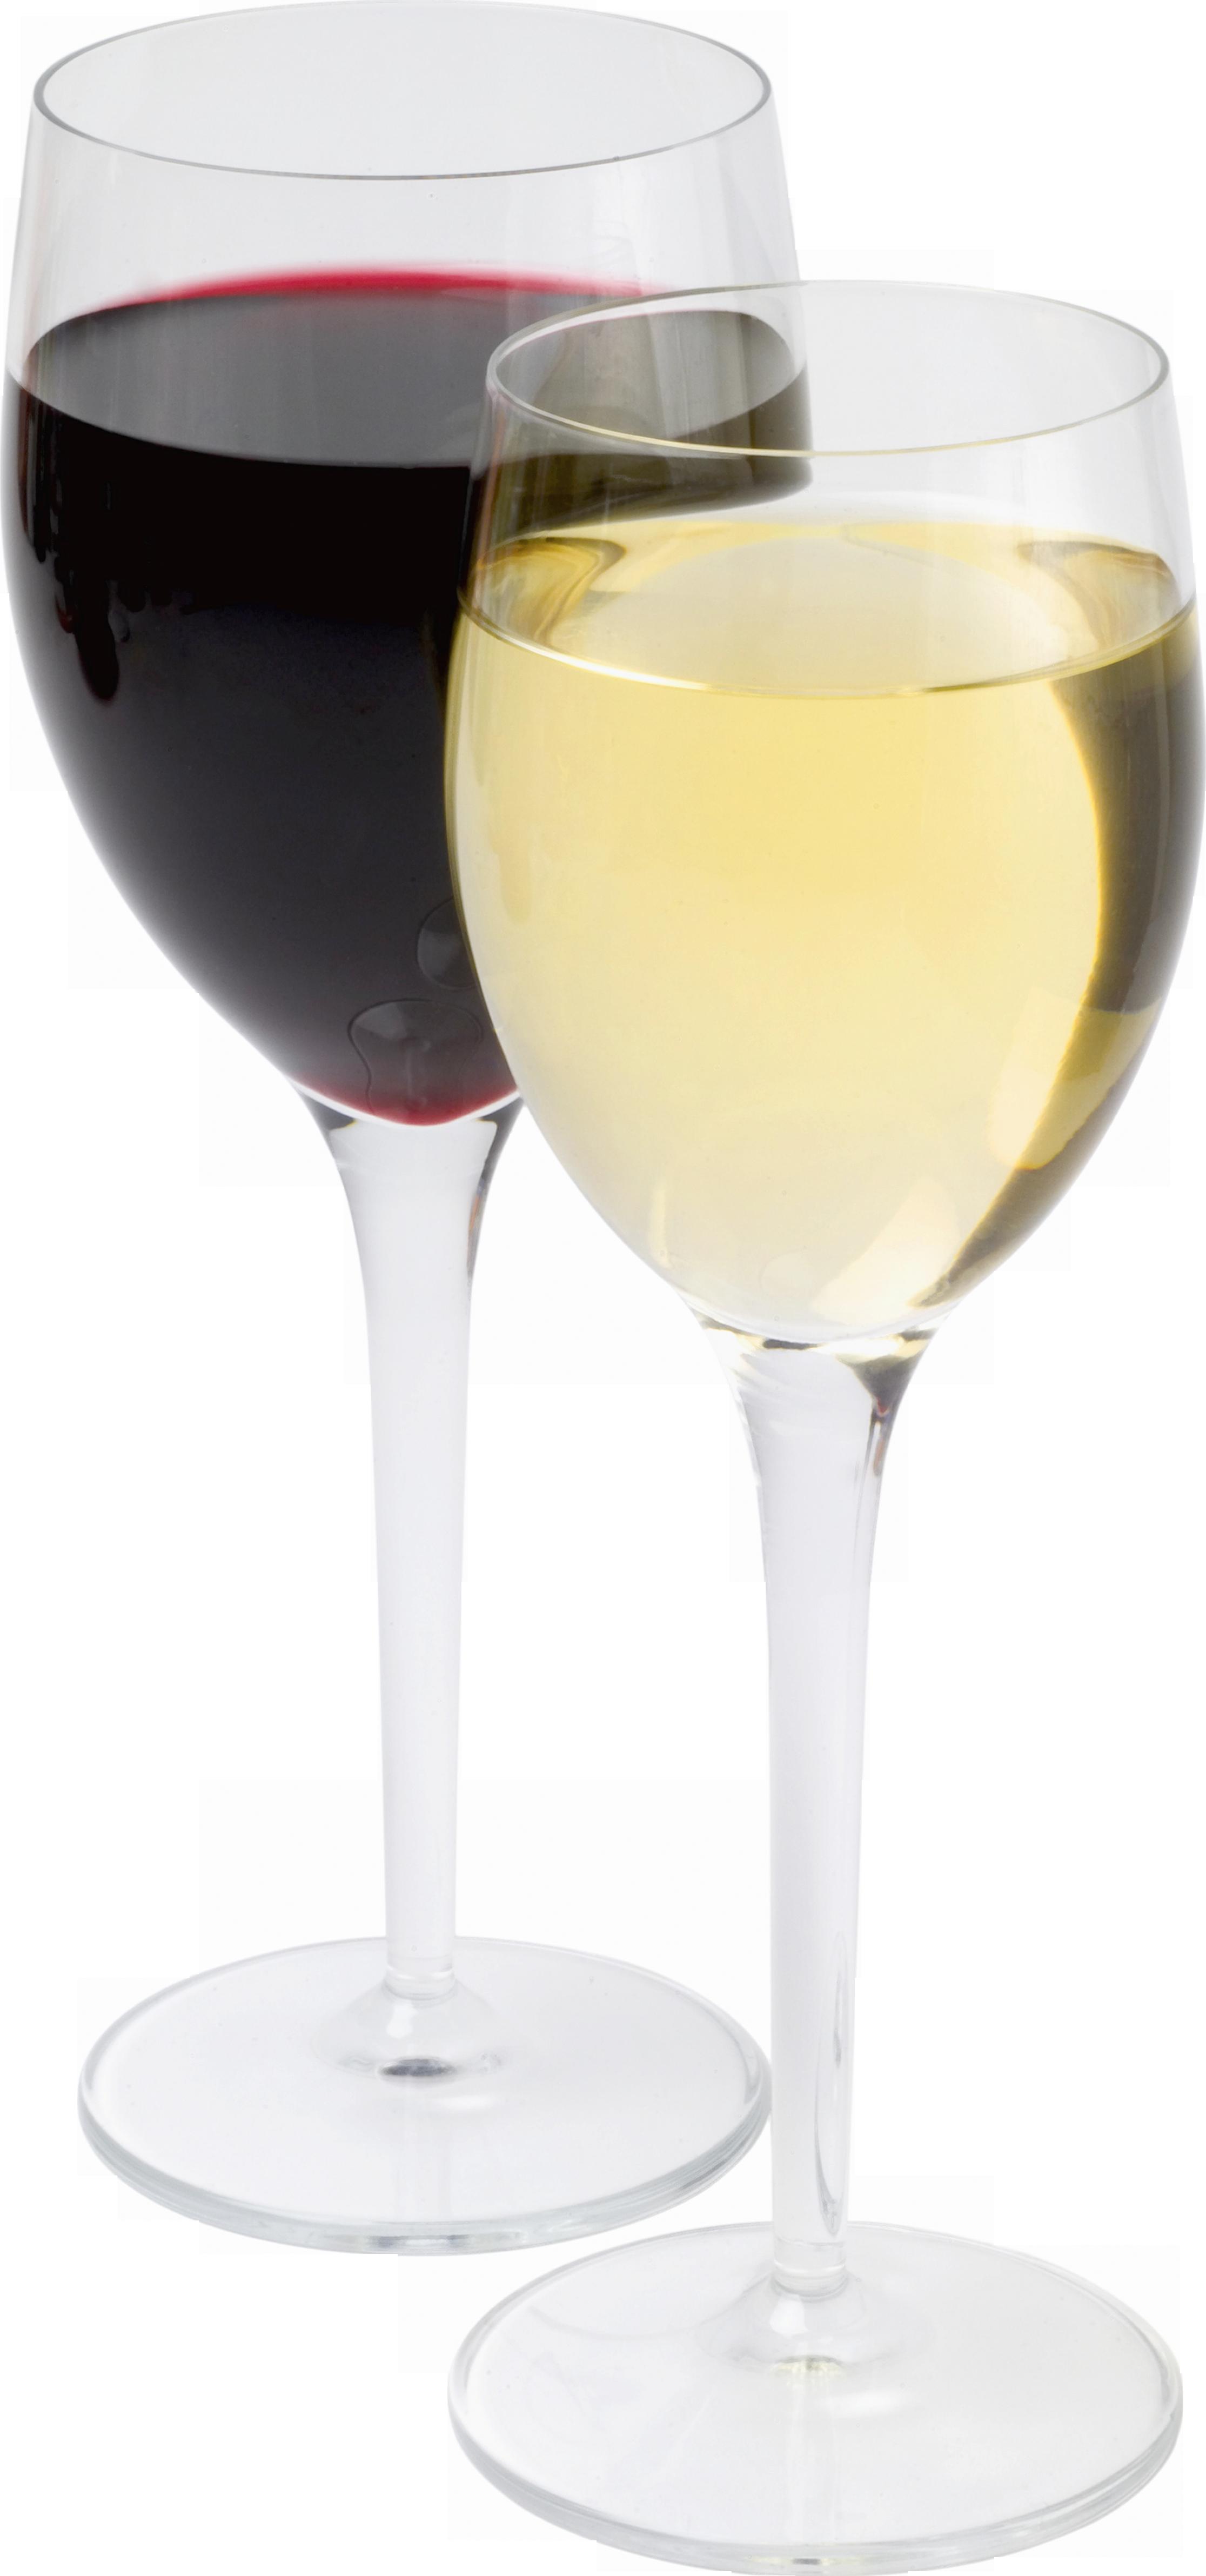 White Wine Glass Transparent Background | www.pixshark.com ...